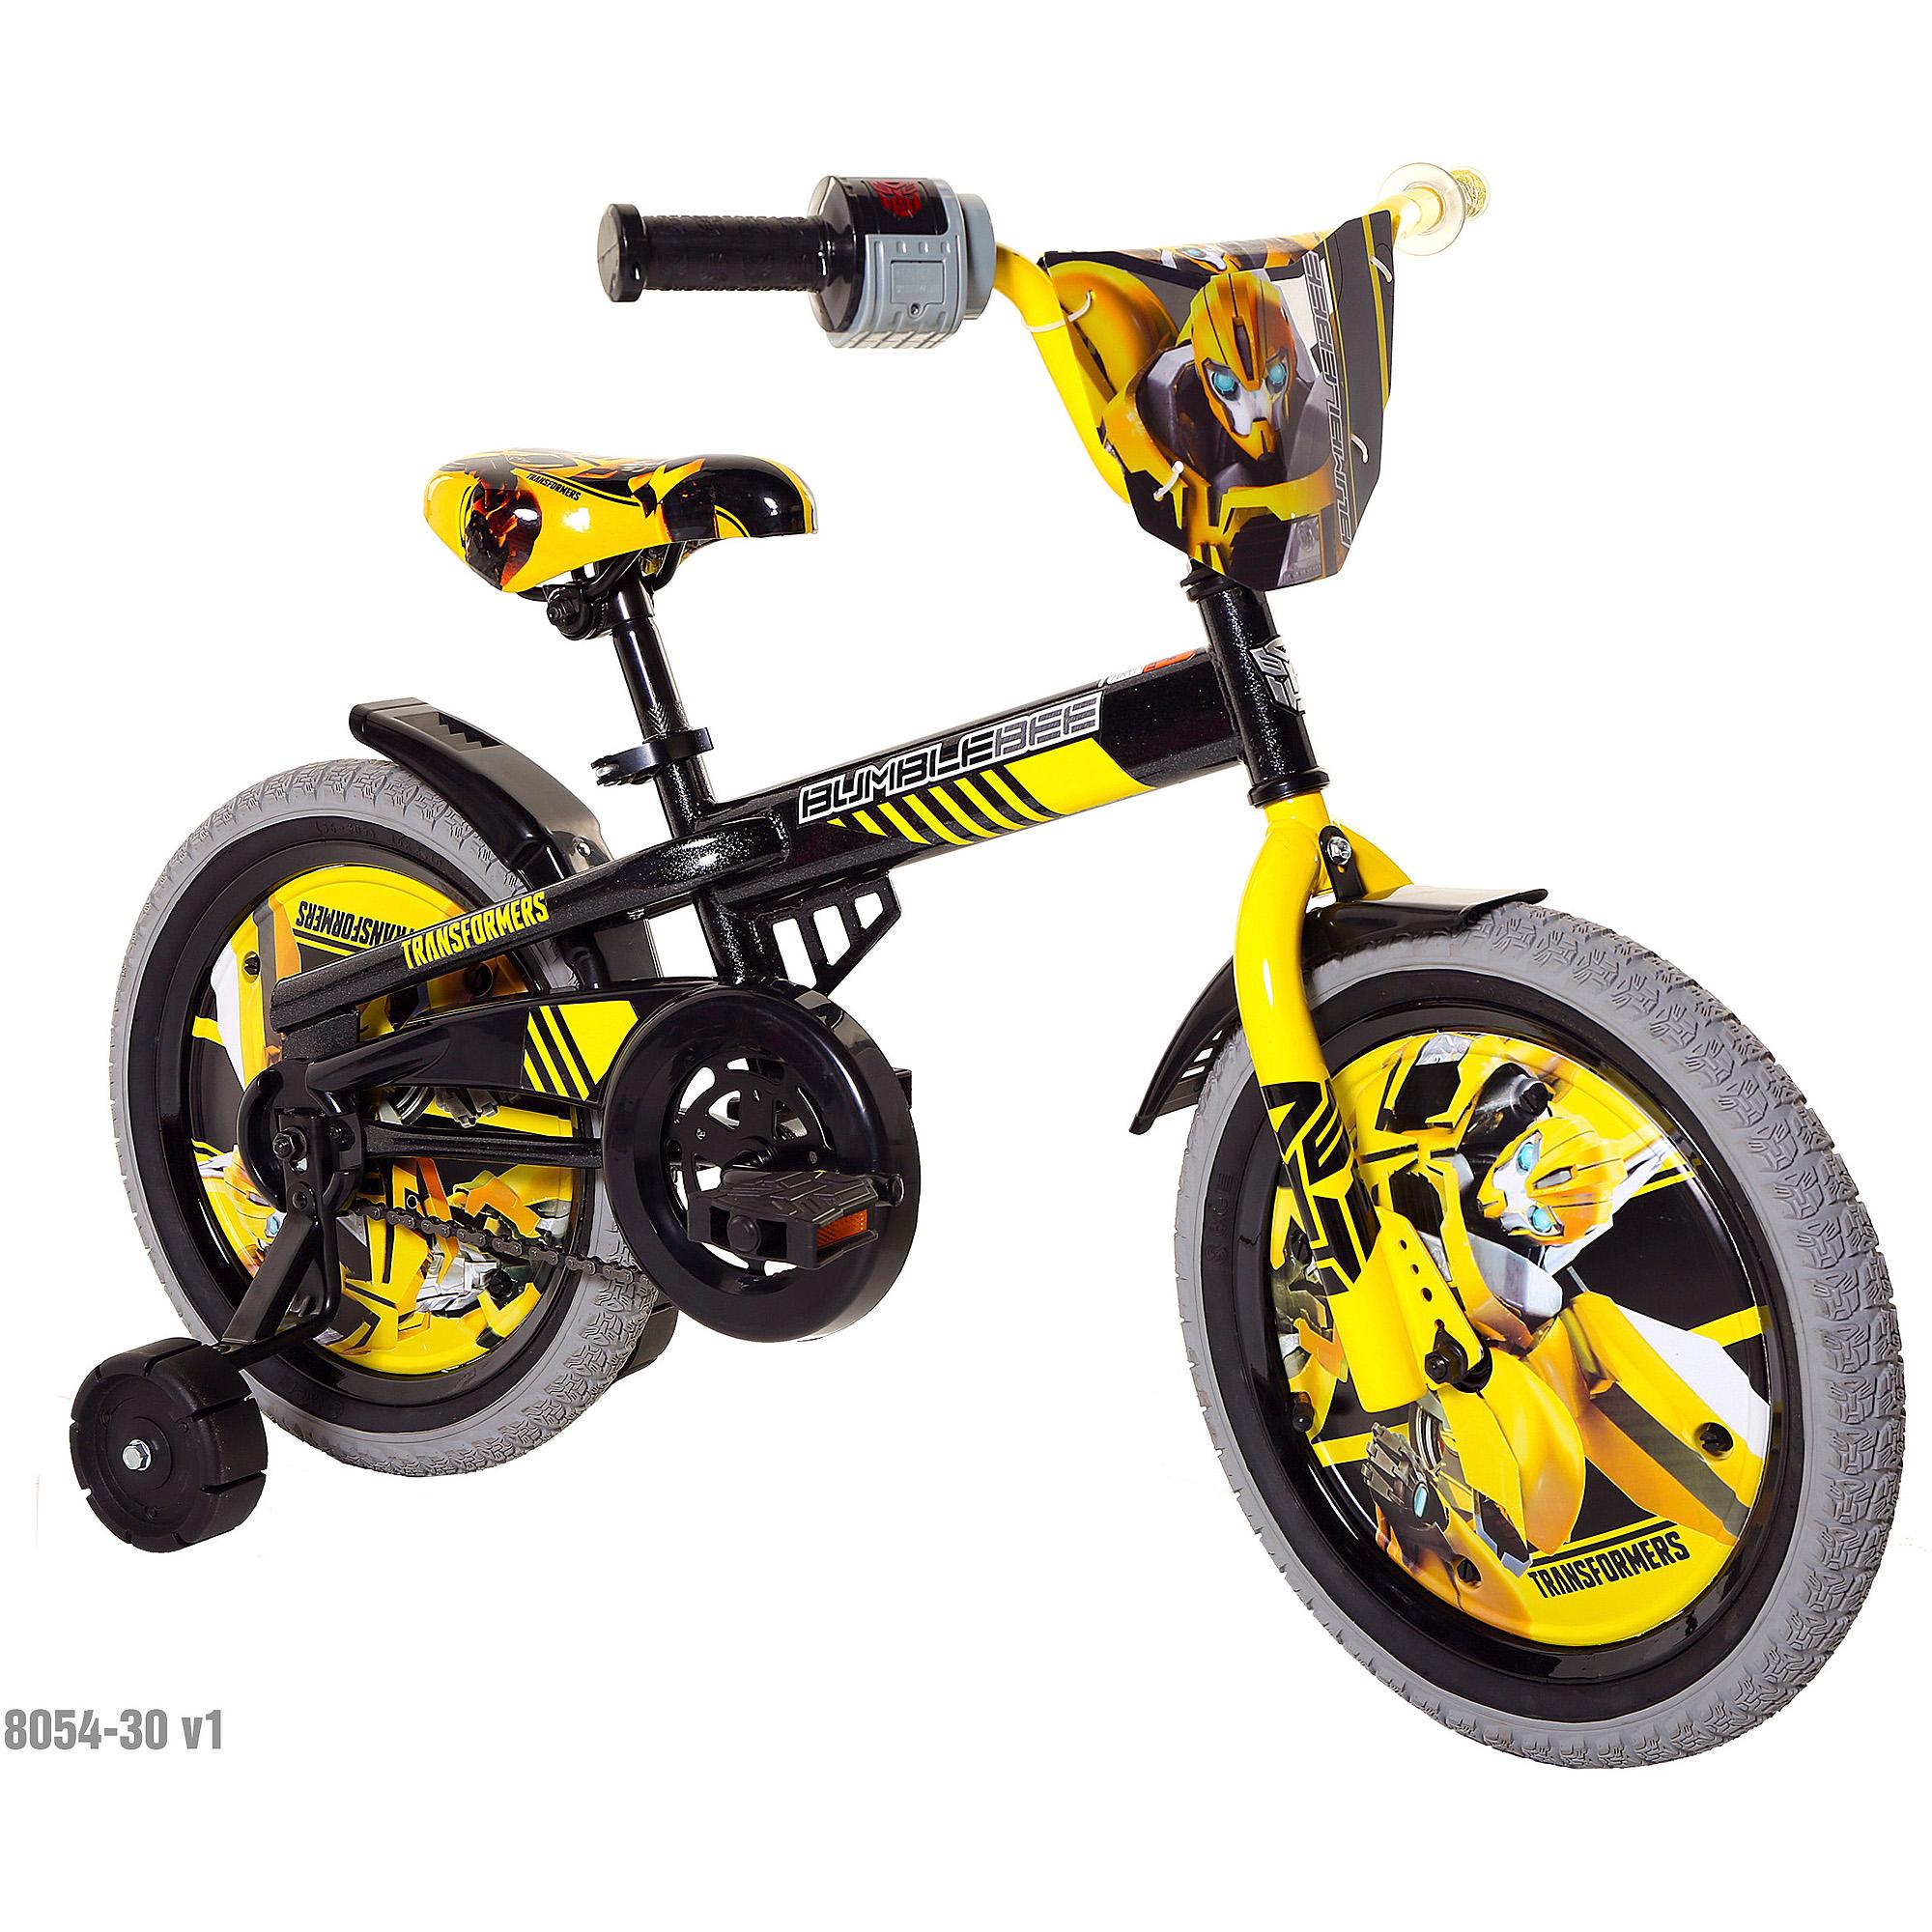 "Transformers Bumblebee 16"" Bicycle"